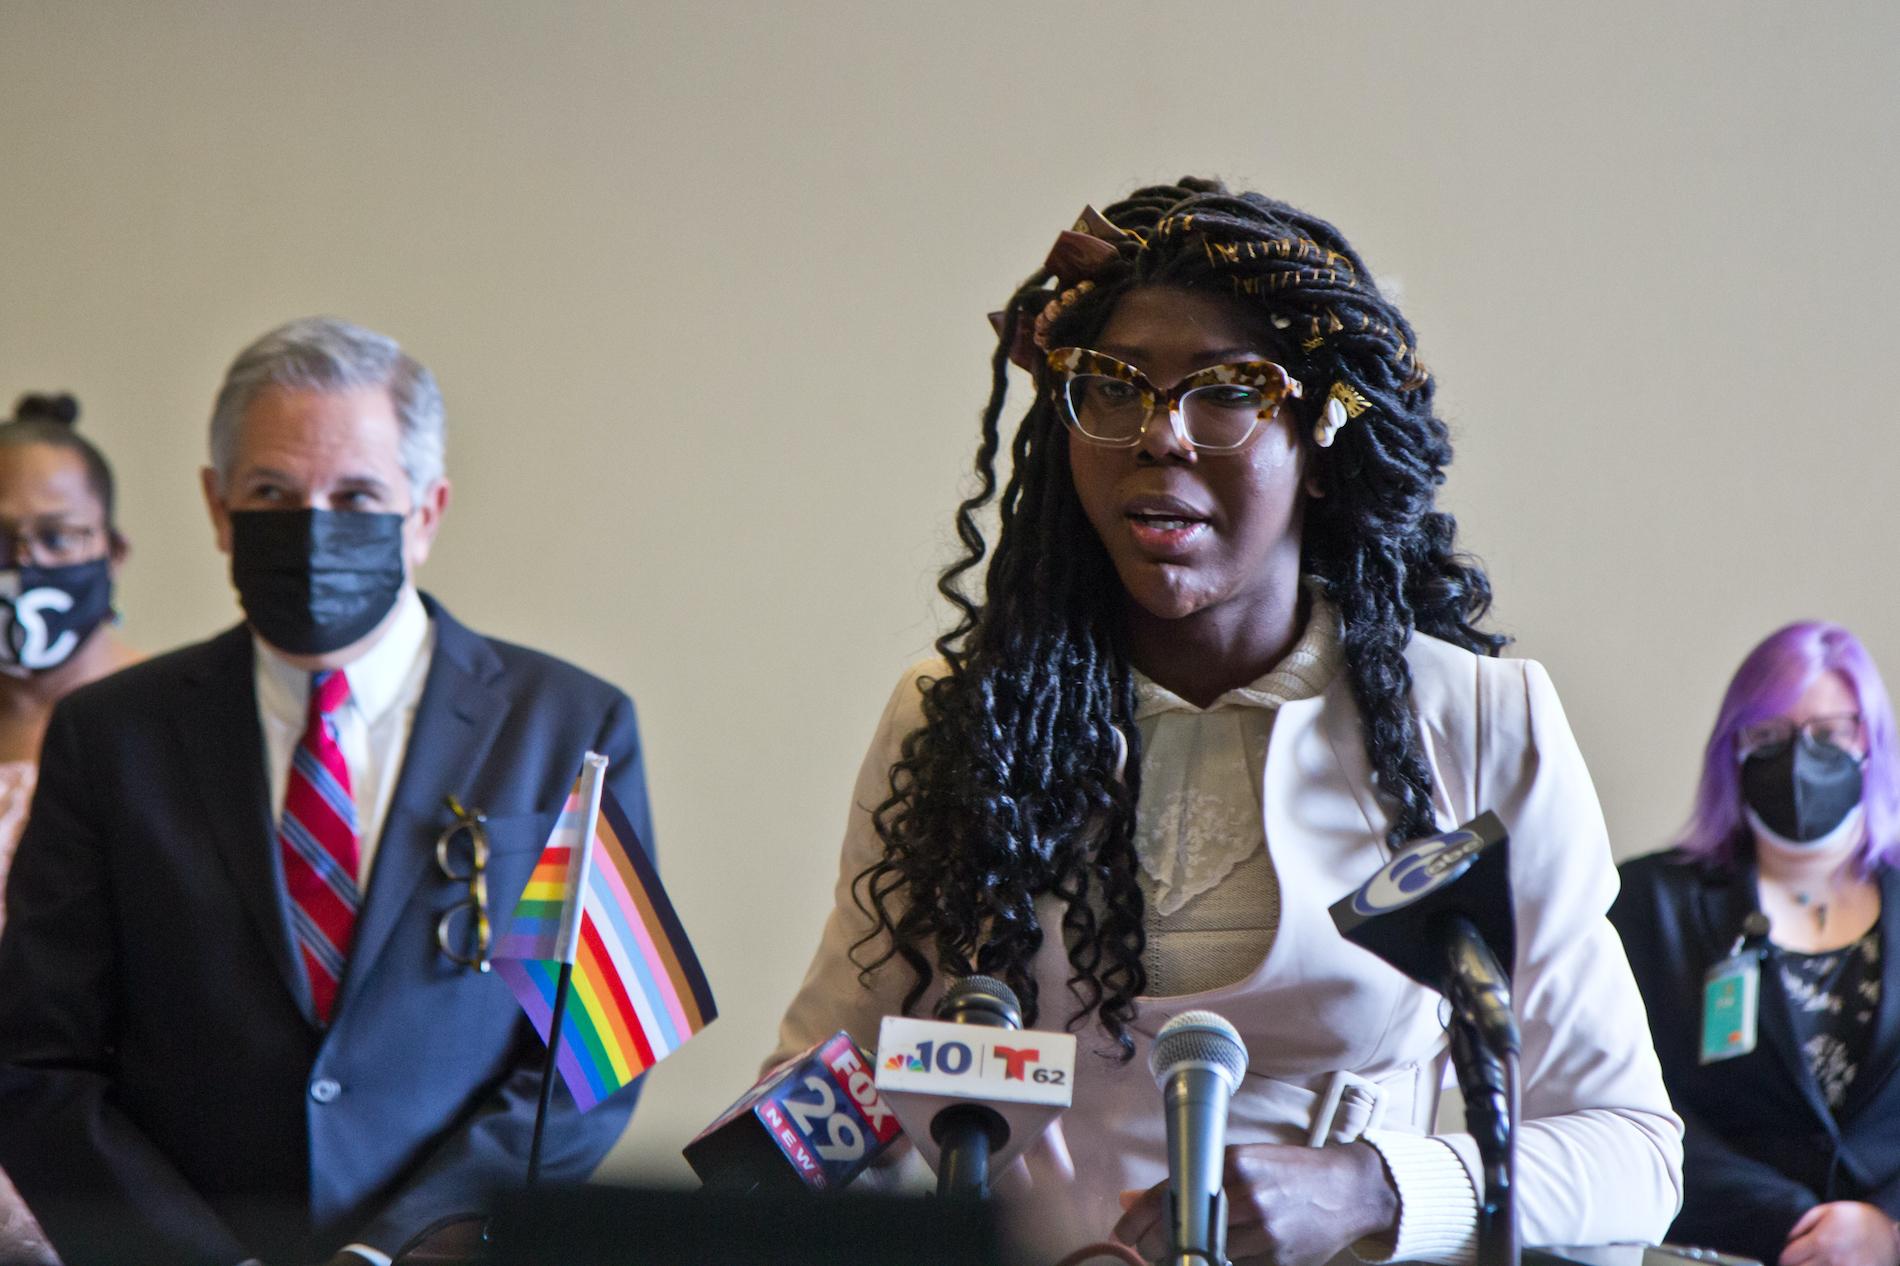 Kendall Stephens speaks at a podium